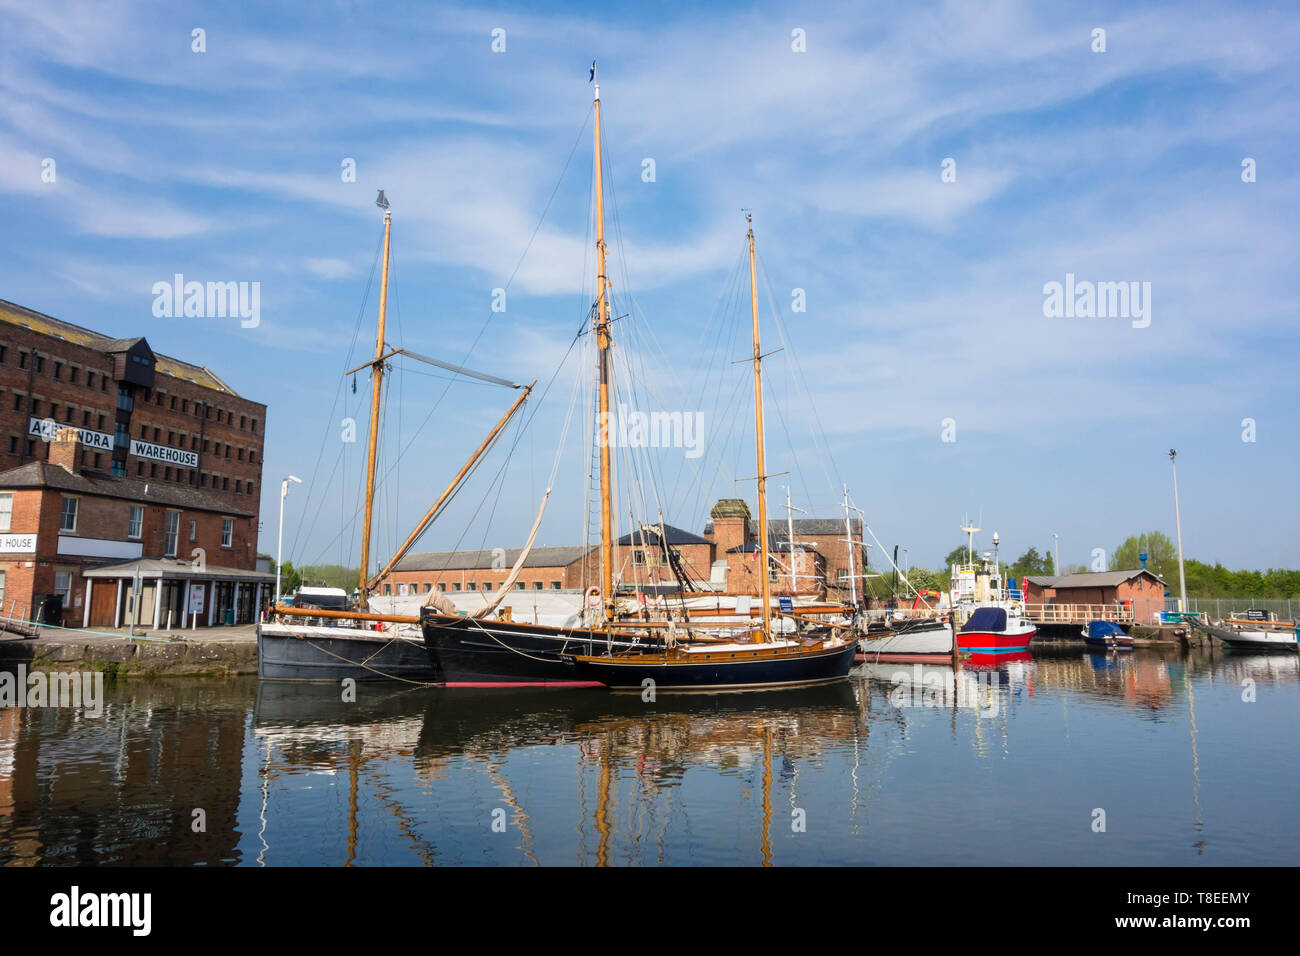 Sailing ships moored at Gloucester docks Gloucestershire England UK. April 2019 - Stock Image